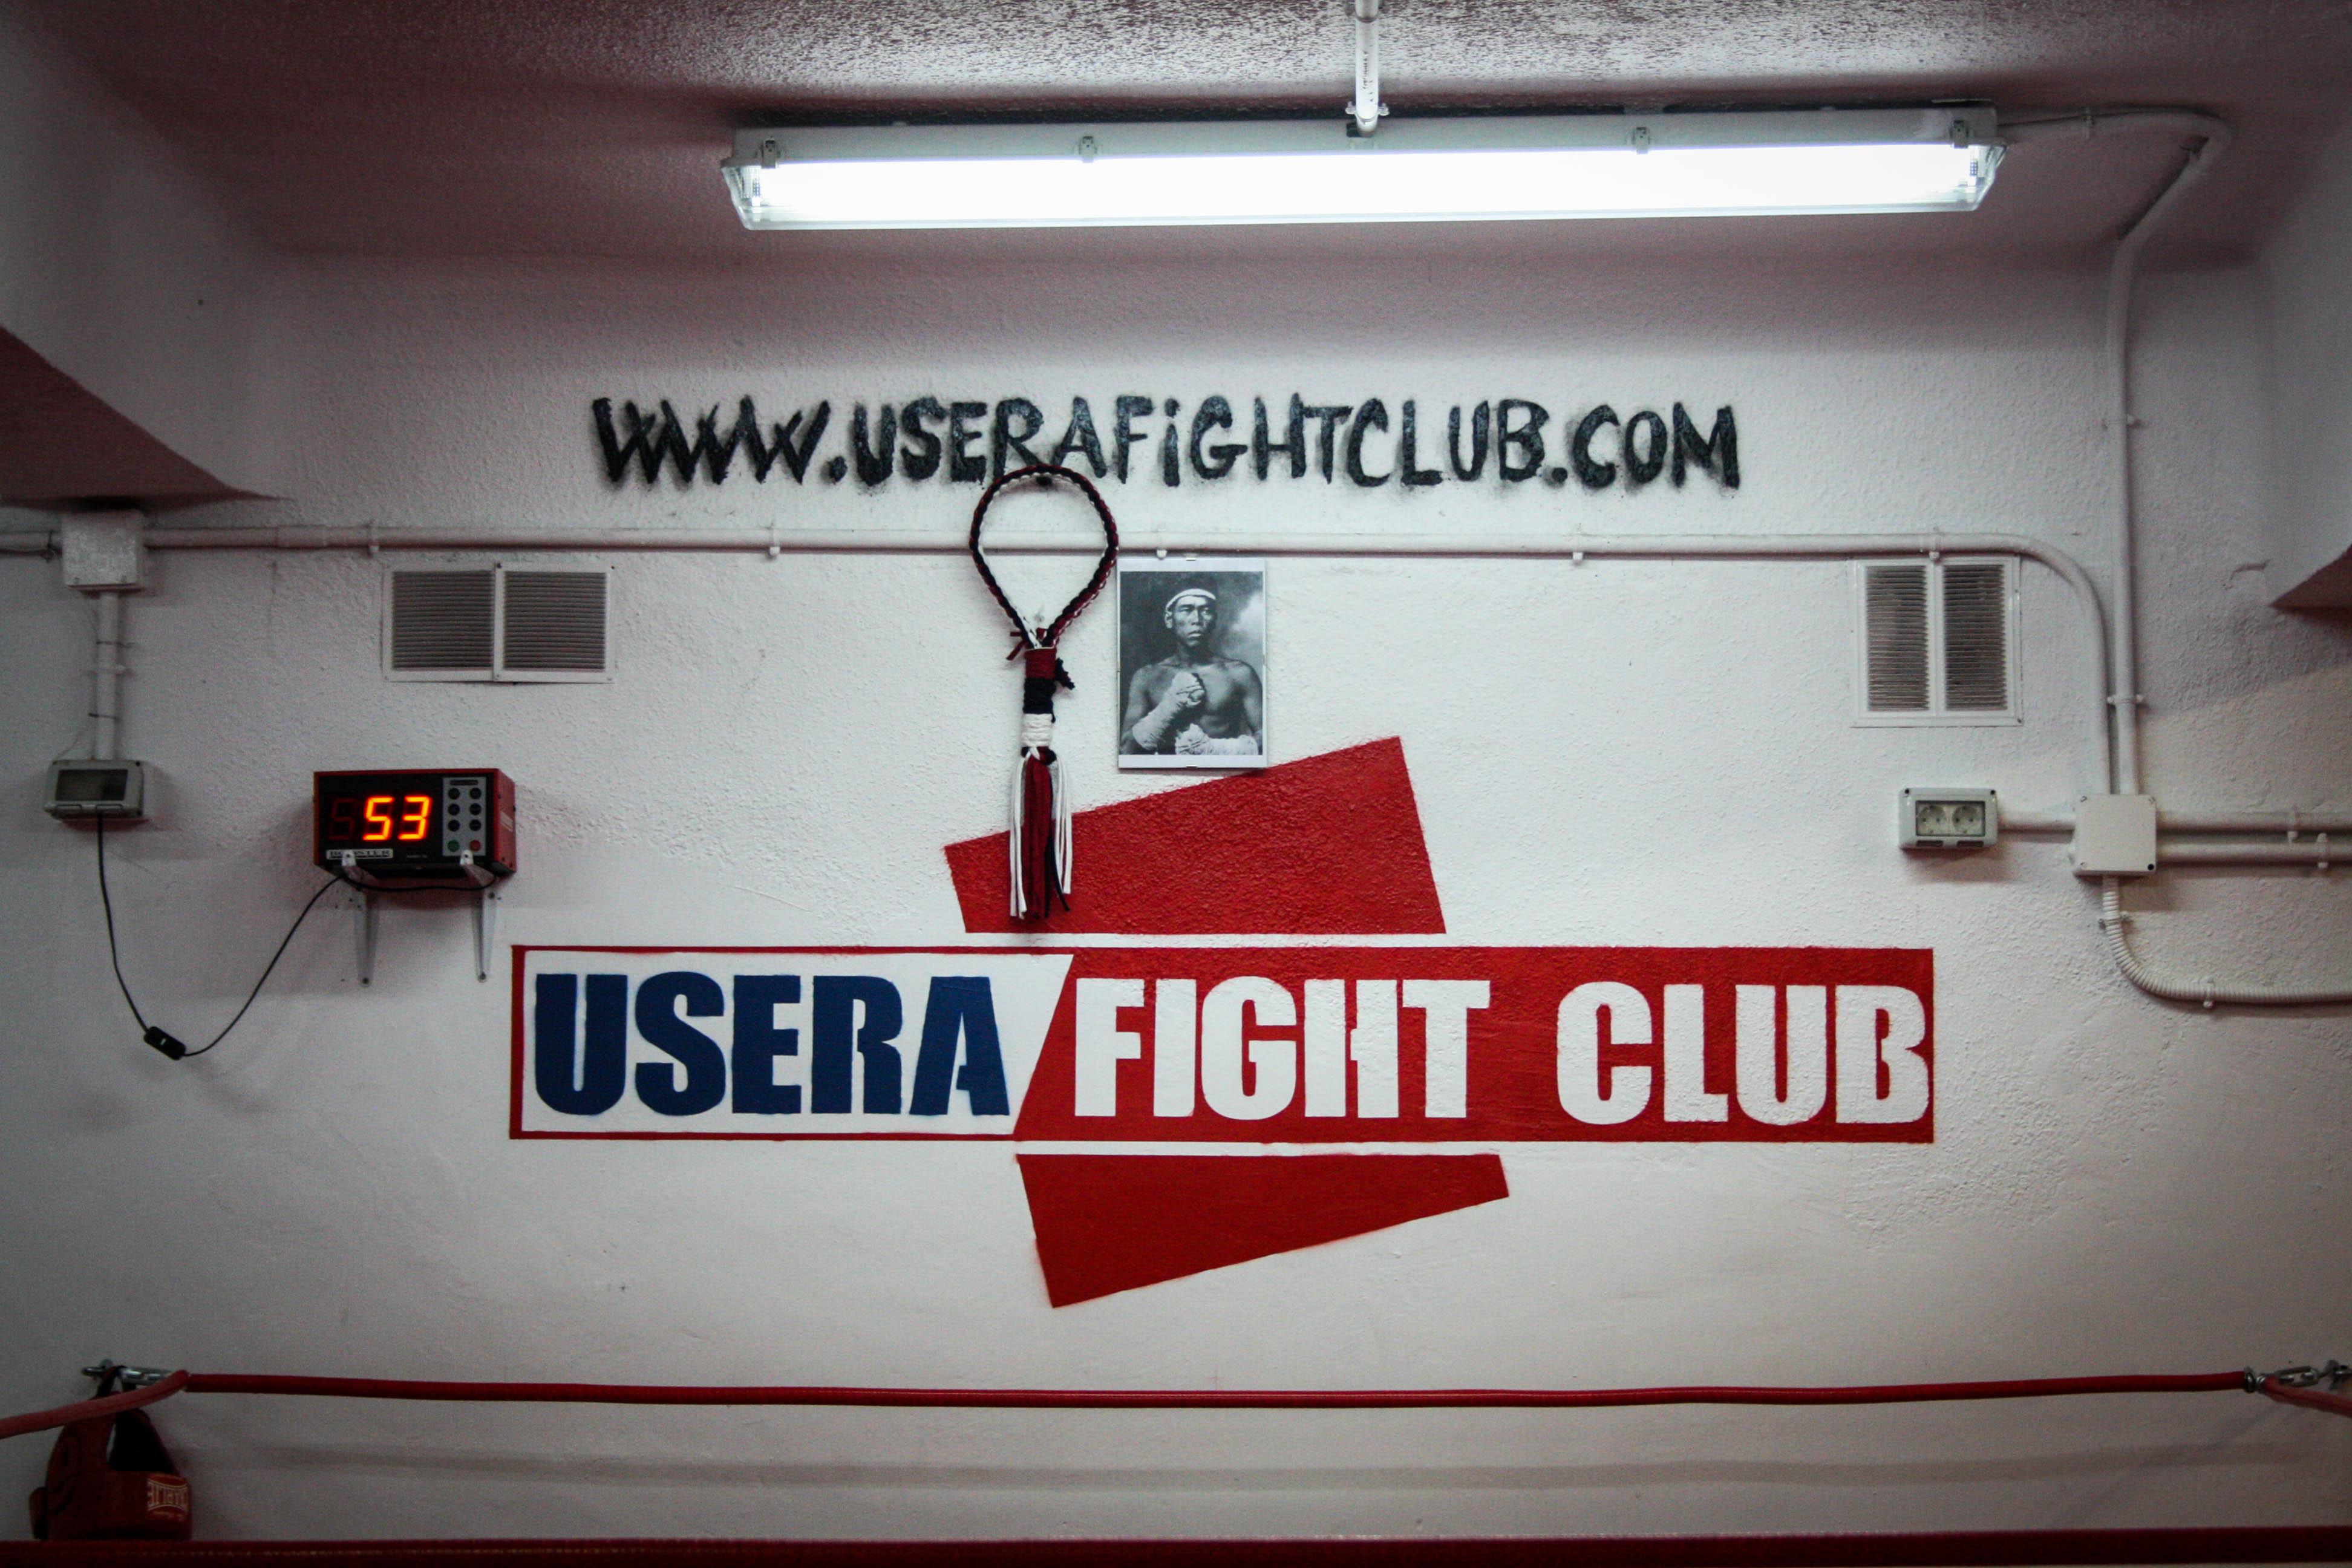 usera fight club mongkol reloj entrenamiento